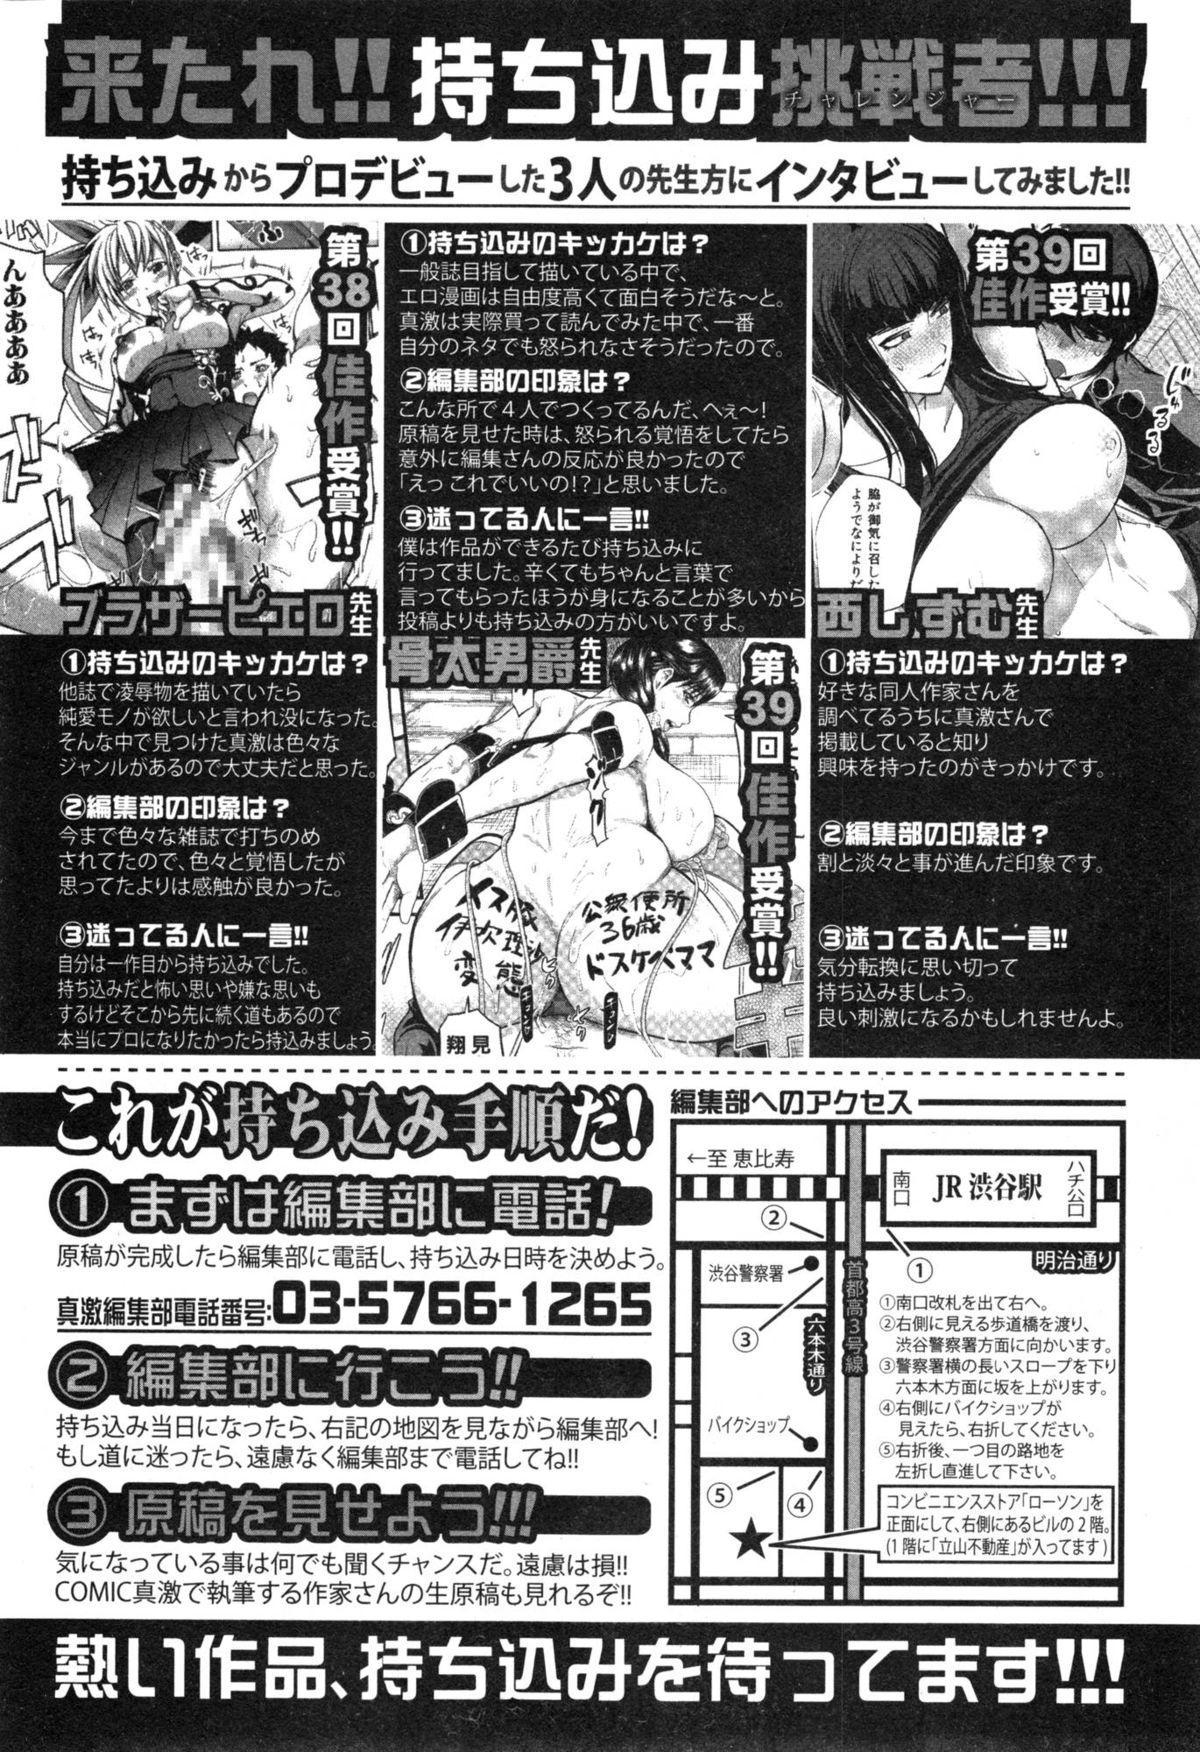 COMIC Shingeki 2015-01 349